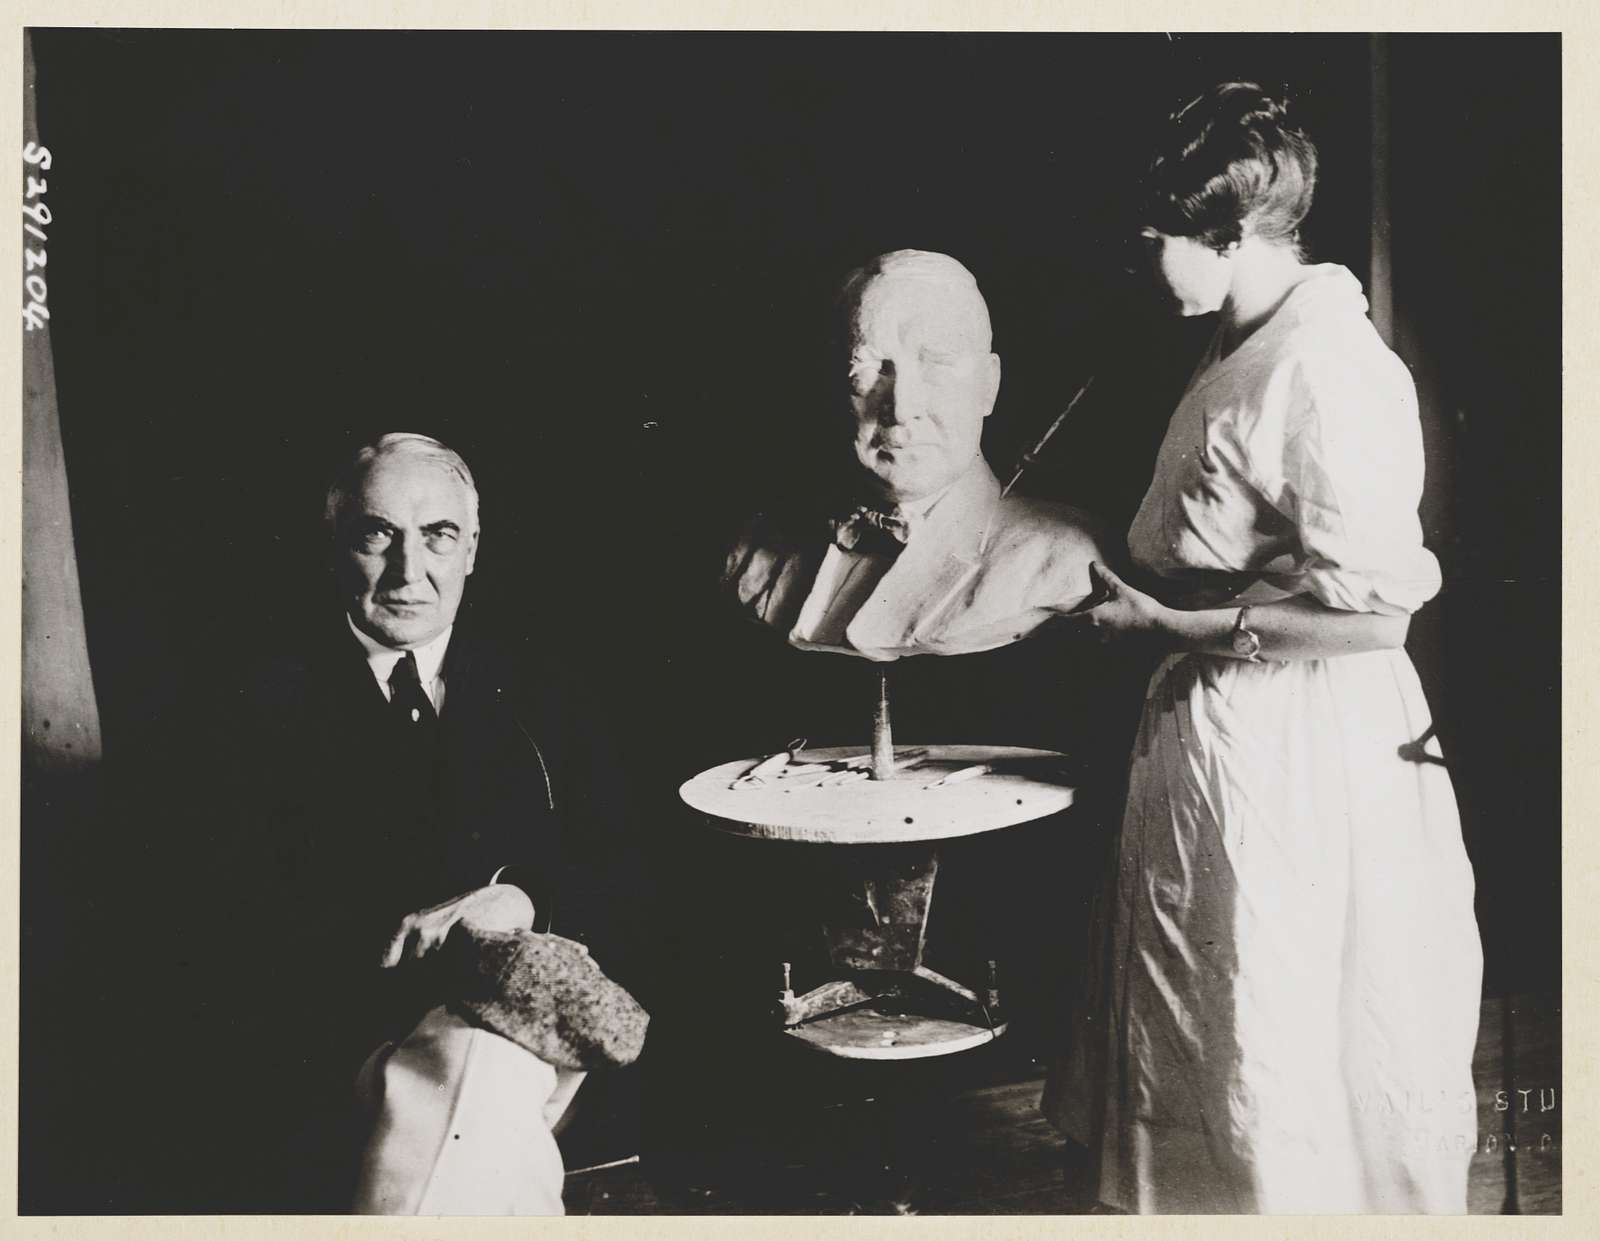 [Sculptress, Helen Osborn, making a head-and-shoulders sculpture of Warren Harding, with Harding posing beside the sculpture]